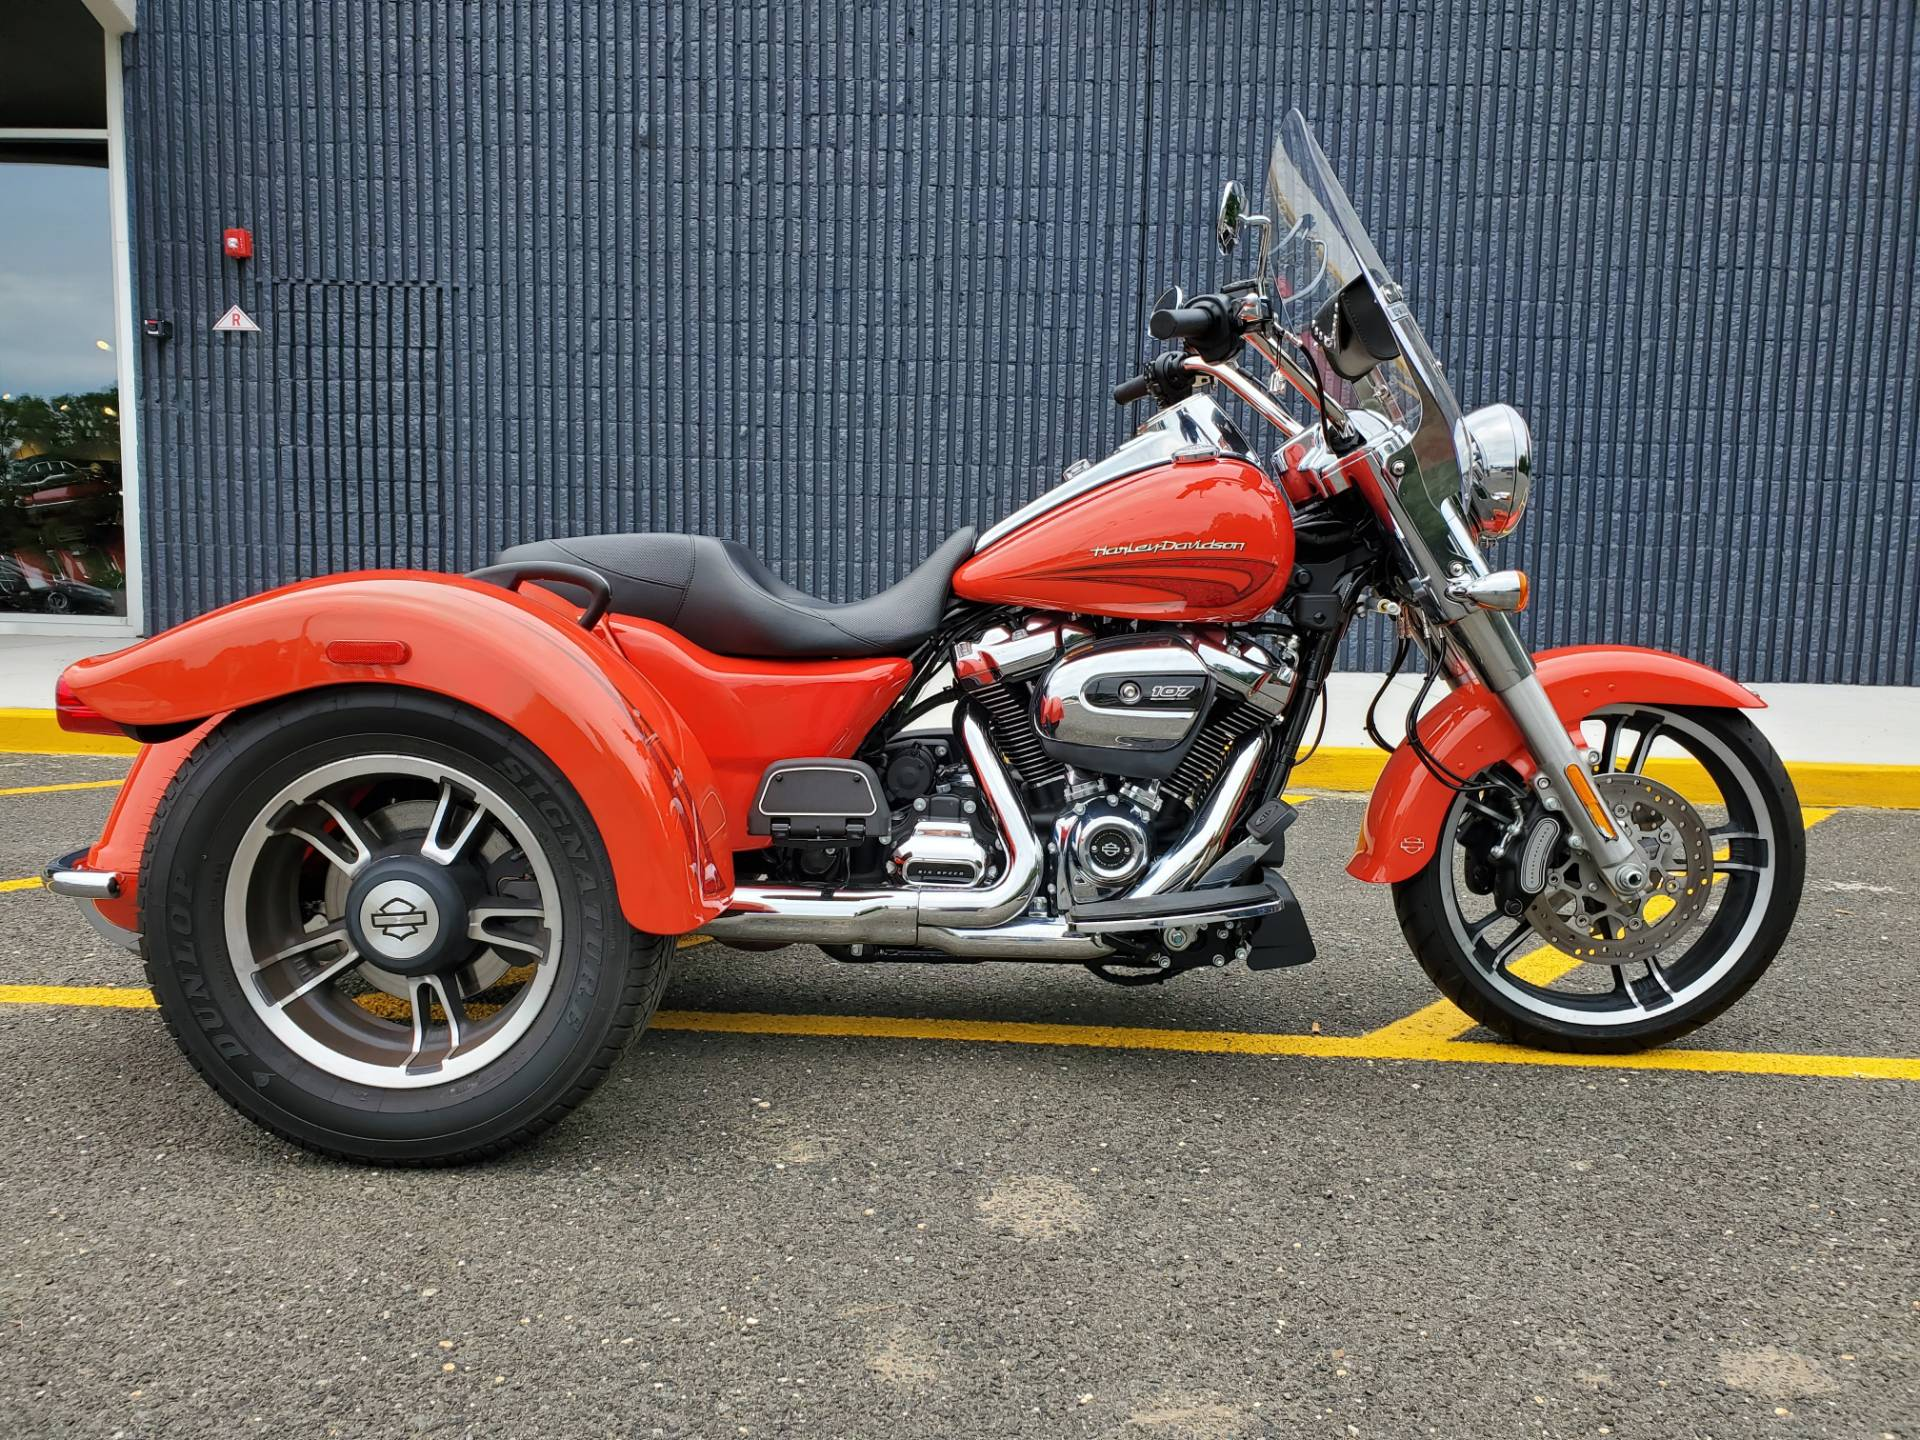 2017 Harley-Davidson Freewheeler in West Long Branch, New Jersey